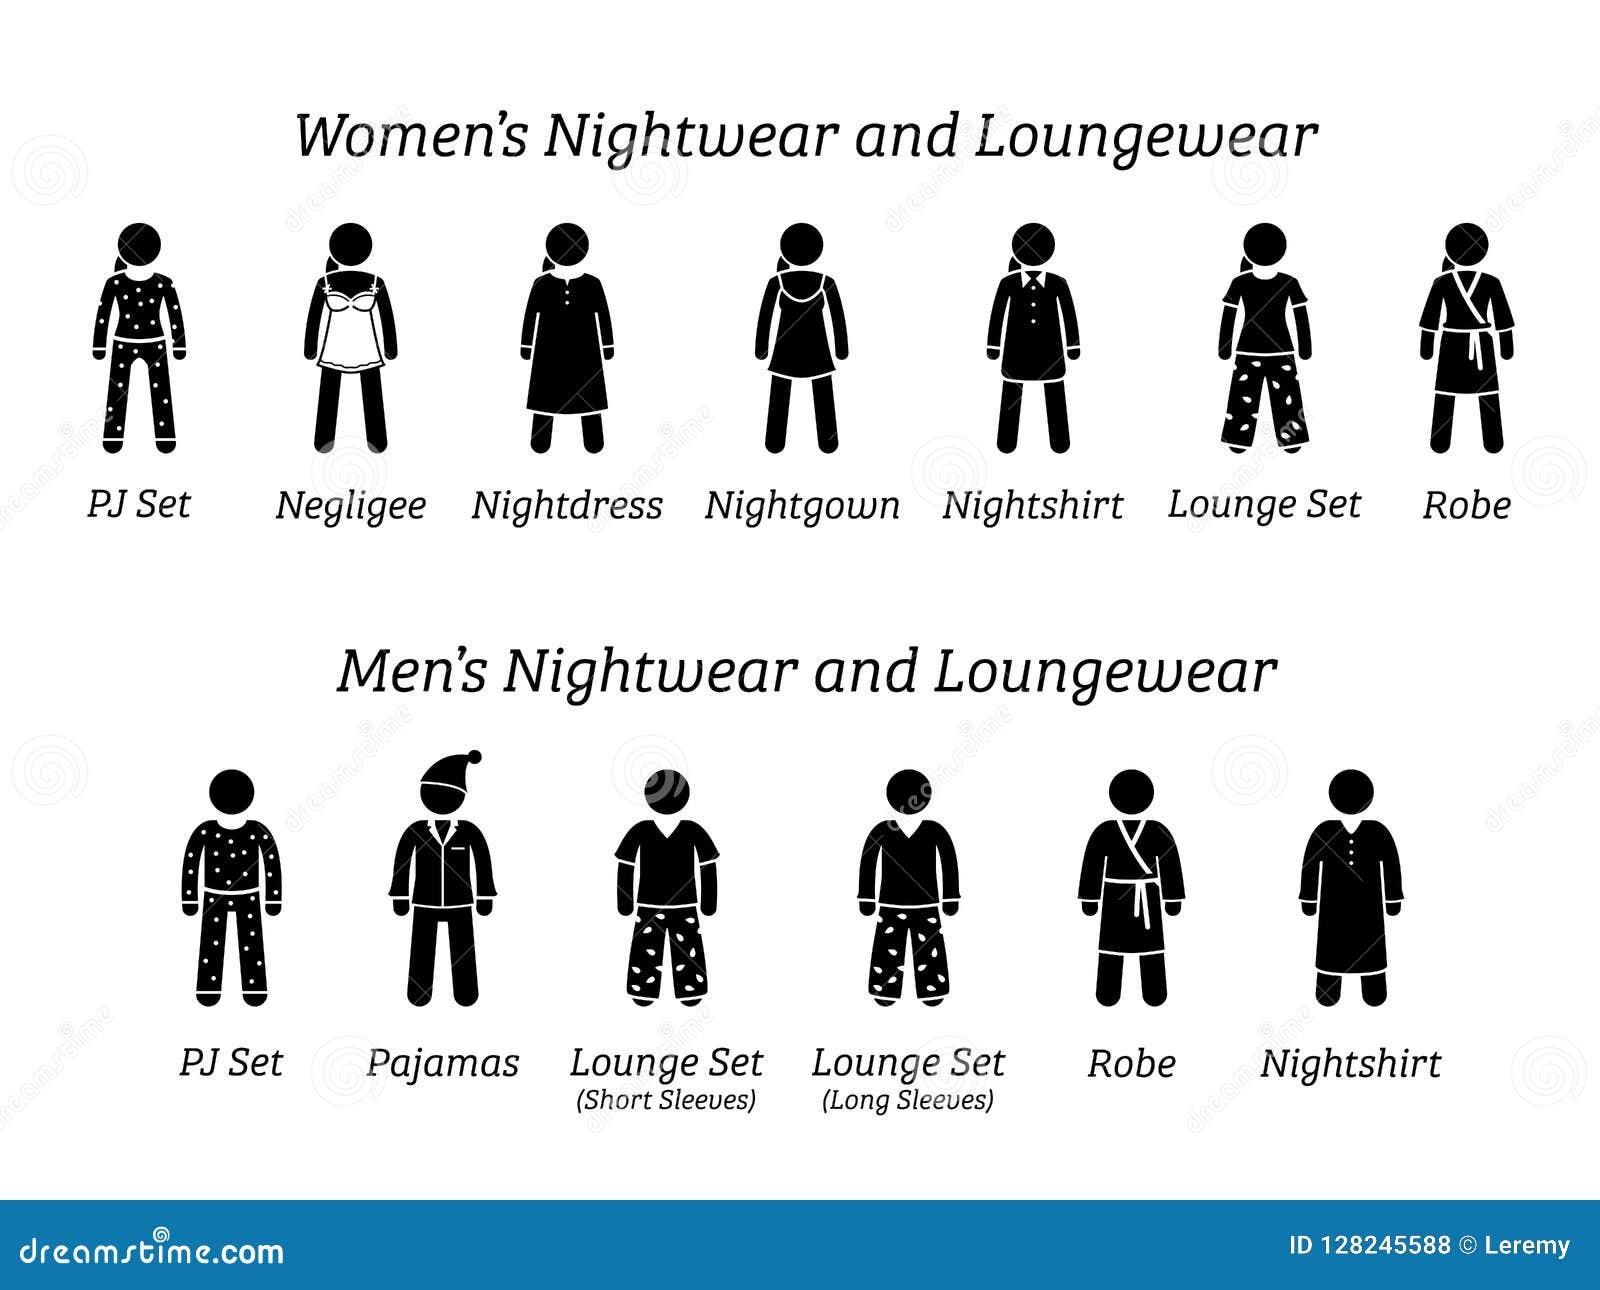 59afbe273e Loungewear Stock Illustrations – 28 Loungewear Stock Illustrations ...